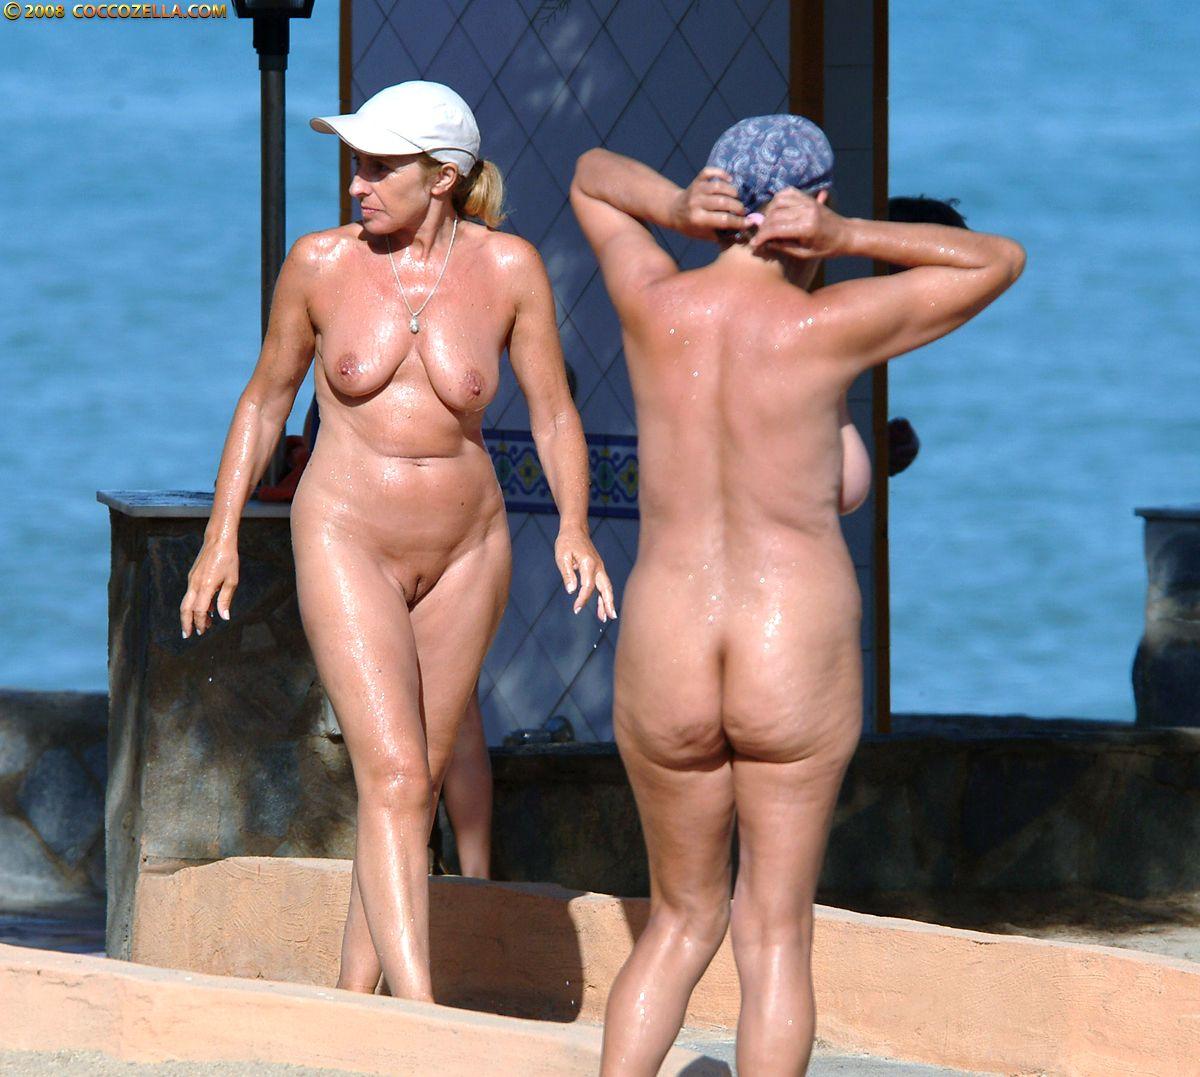 Nude at vera beach